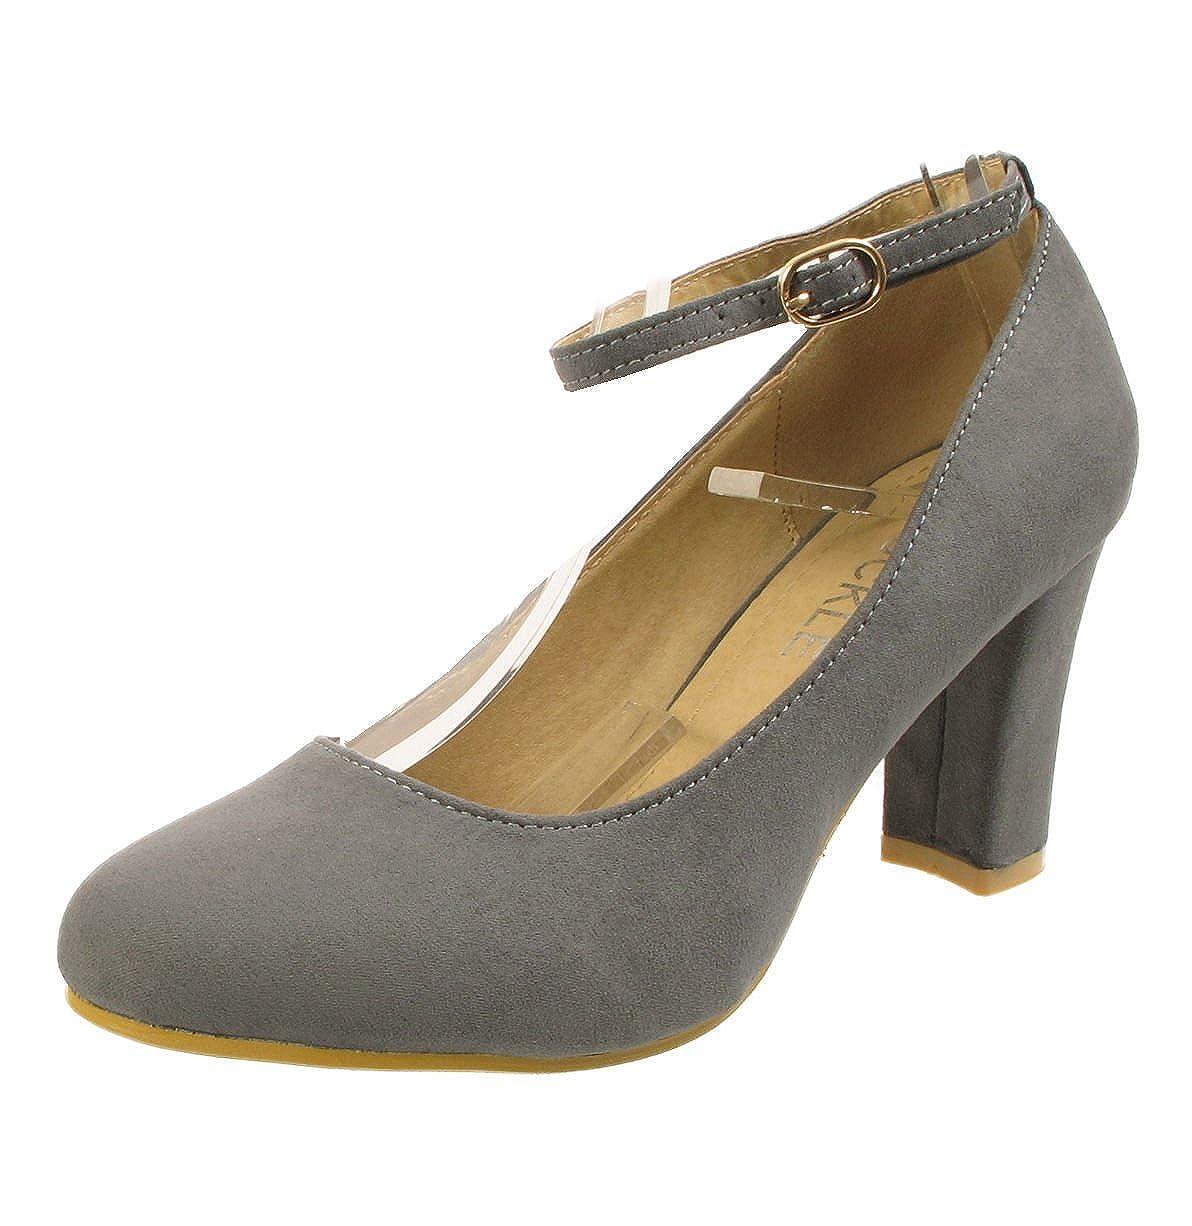 Womens Ladies Block Heel Ankle Strap Work Court Evening Dress Girls Shoes Pumps UK Size 3-12